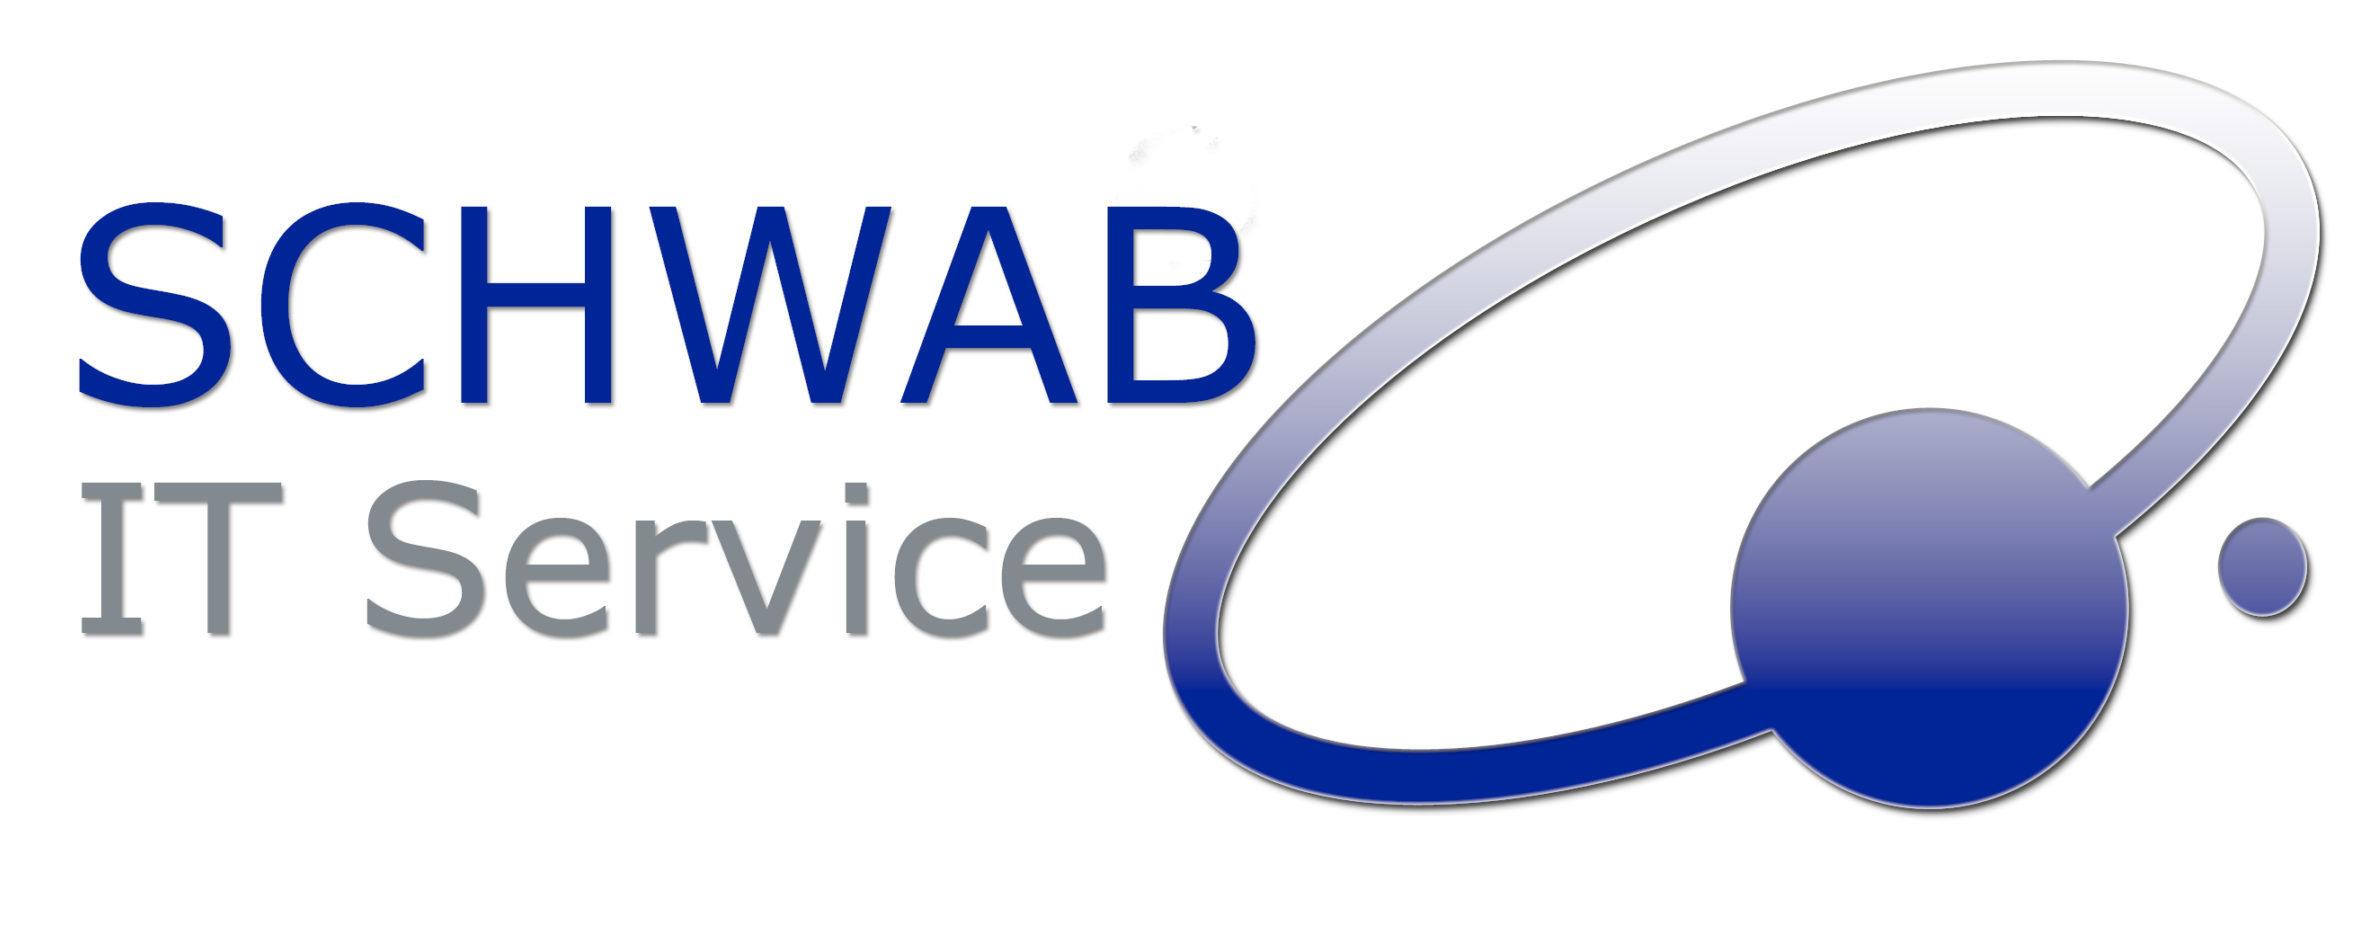 SCHWAB IT Service